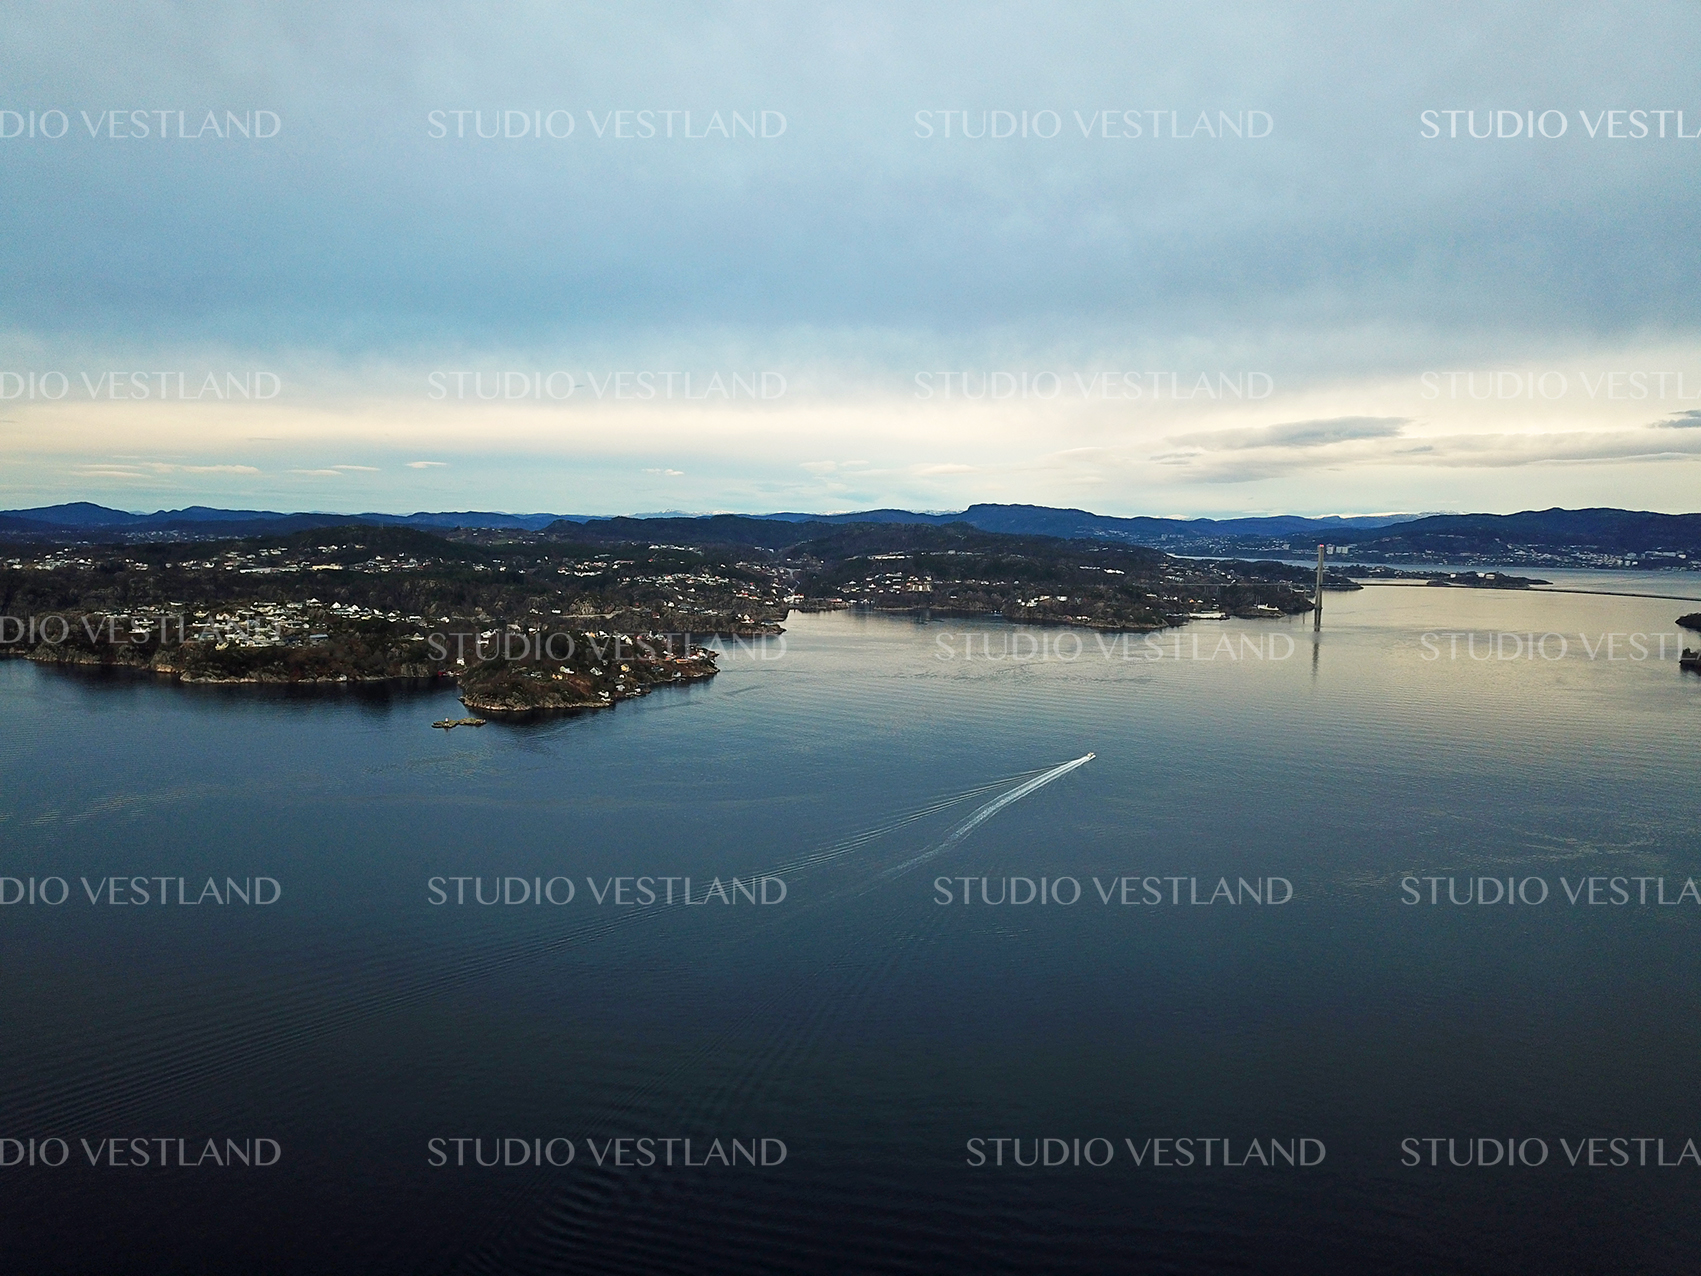 Studio Vestland - Sotra 03